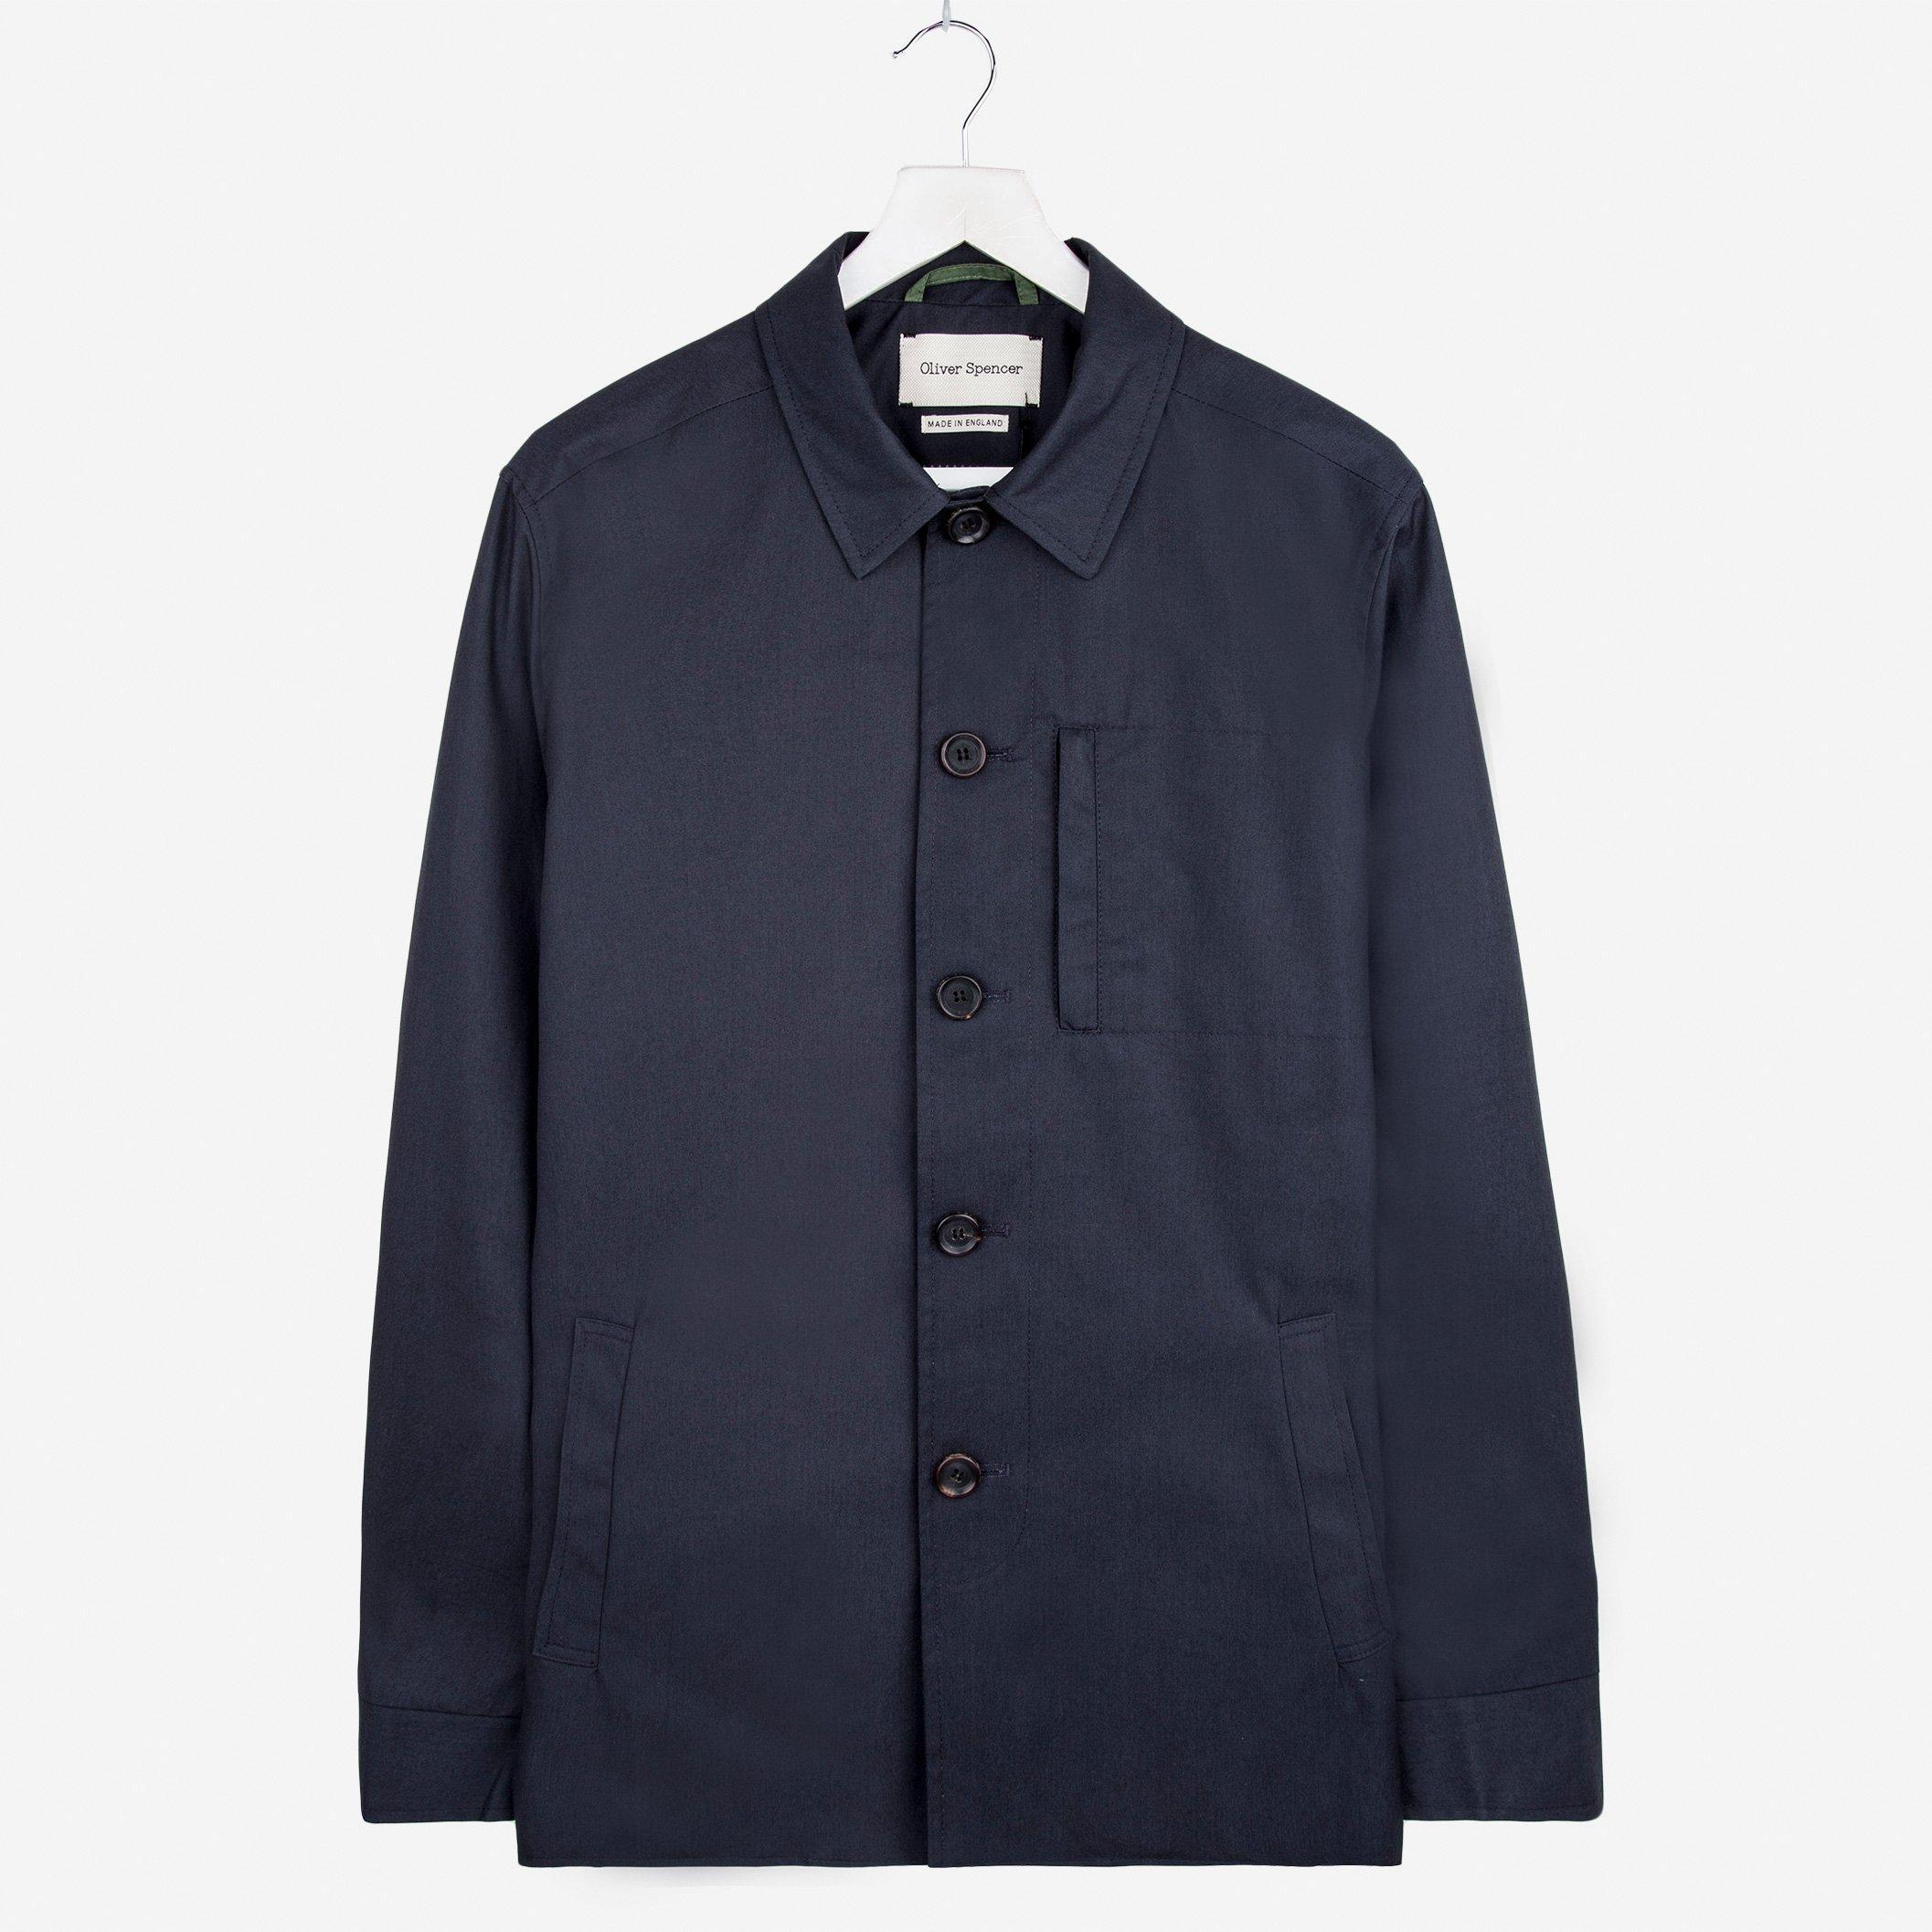 Oliver Spencer Portobello Jacket Lawford Navy